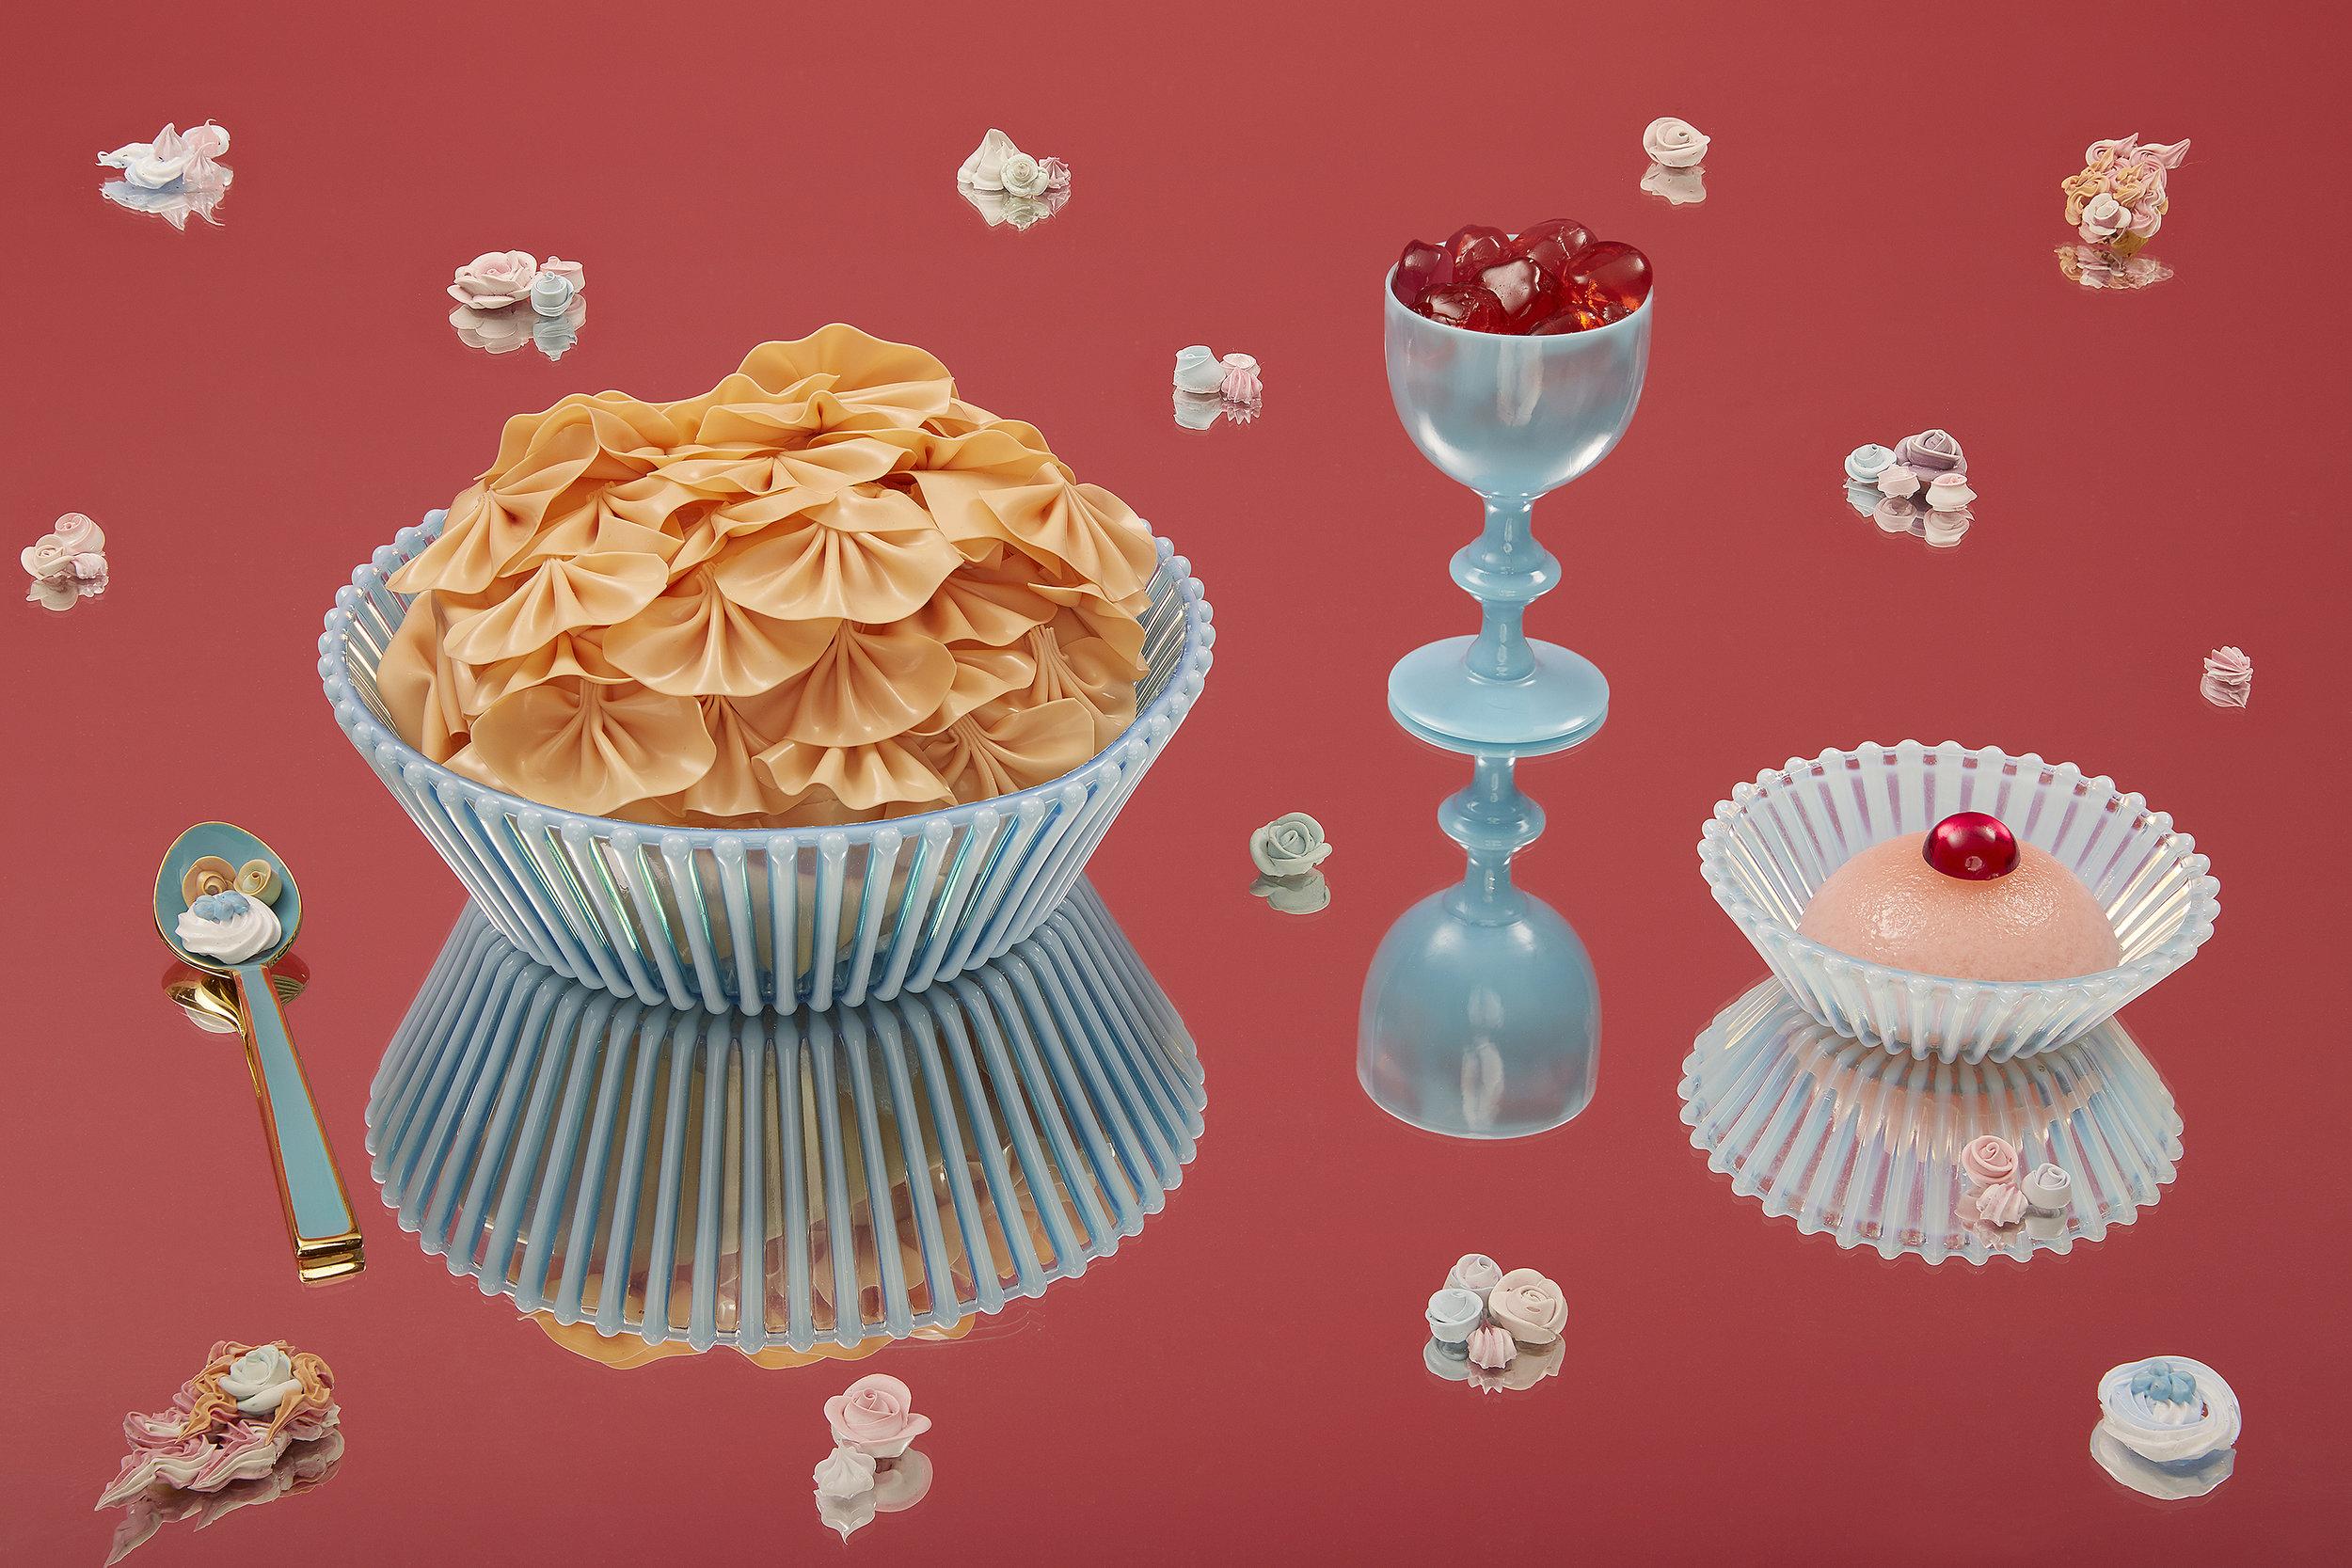 hadas.stills.bowls.1.print copy.jpg